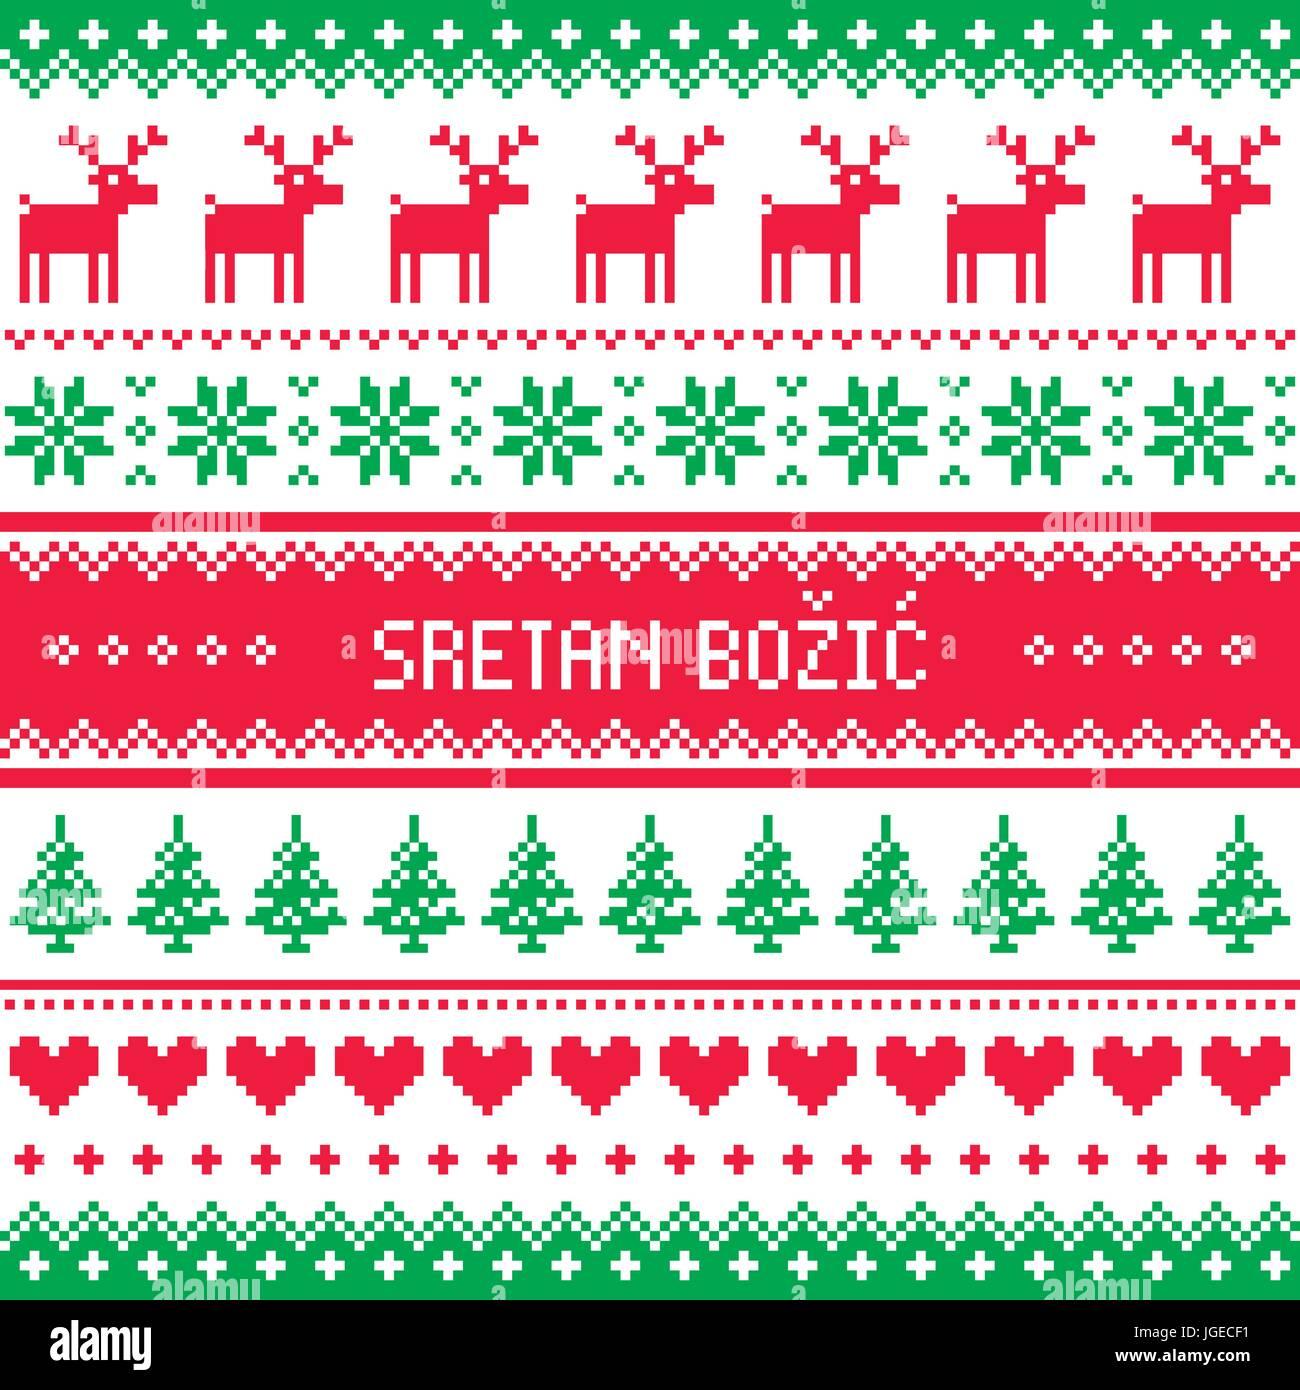 Sretan Bozic - Merry Christmas in Croatian and Bosnian greetings card, seamless pattern - Stock Vector